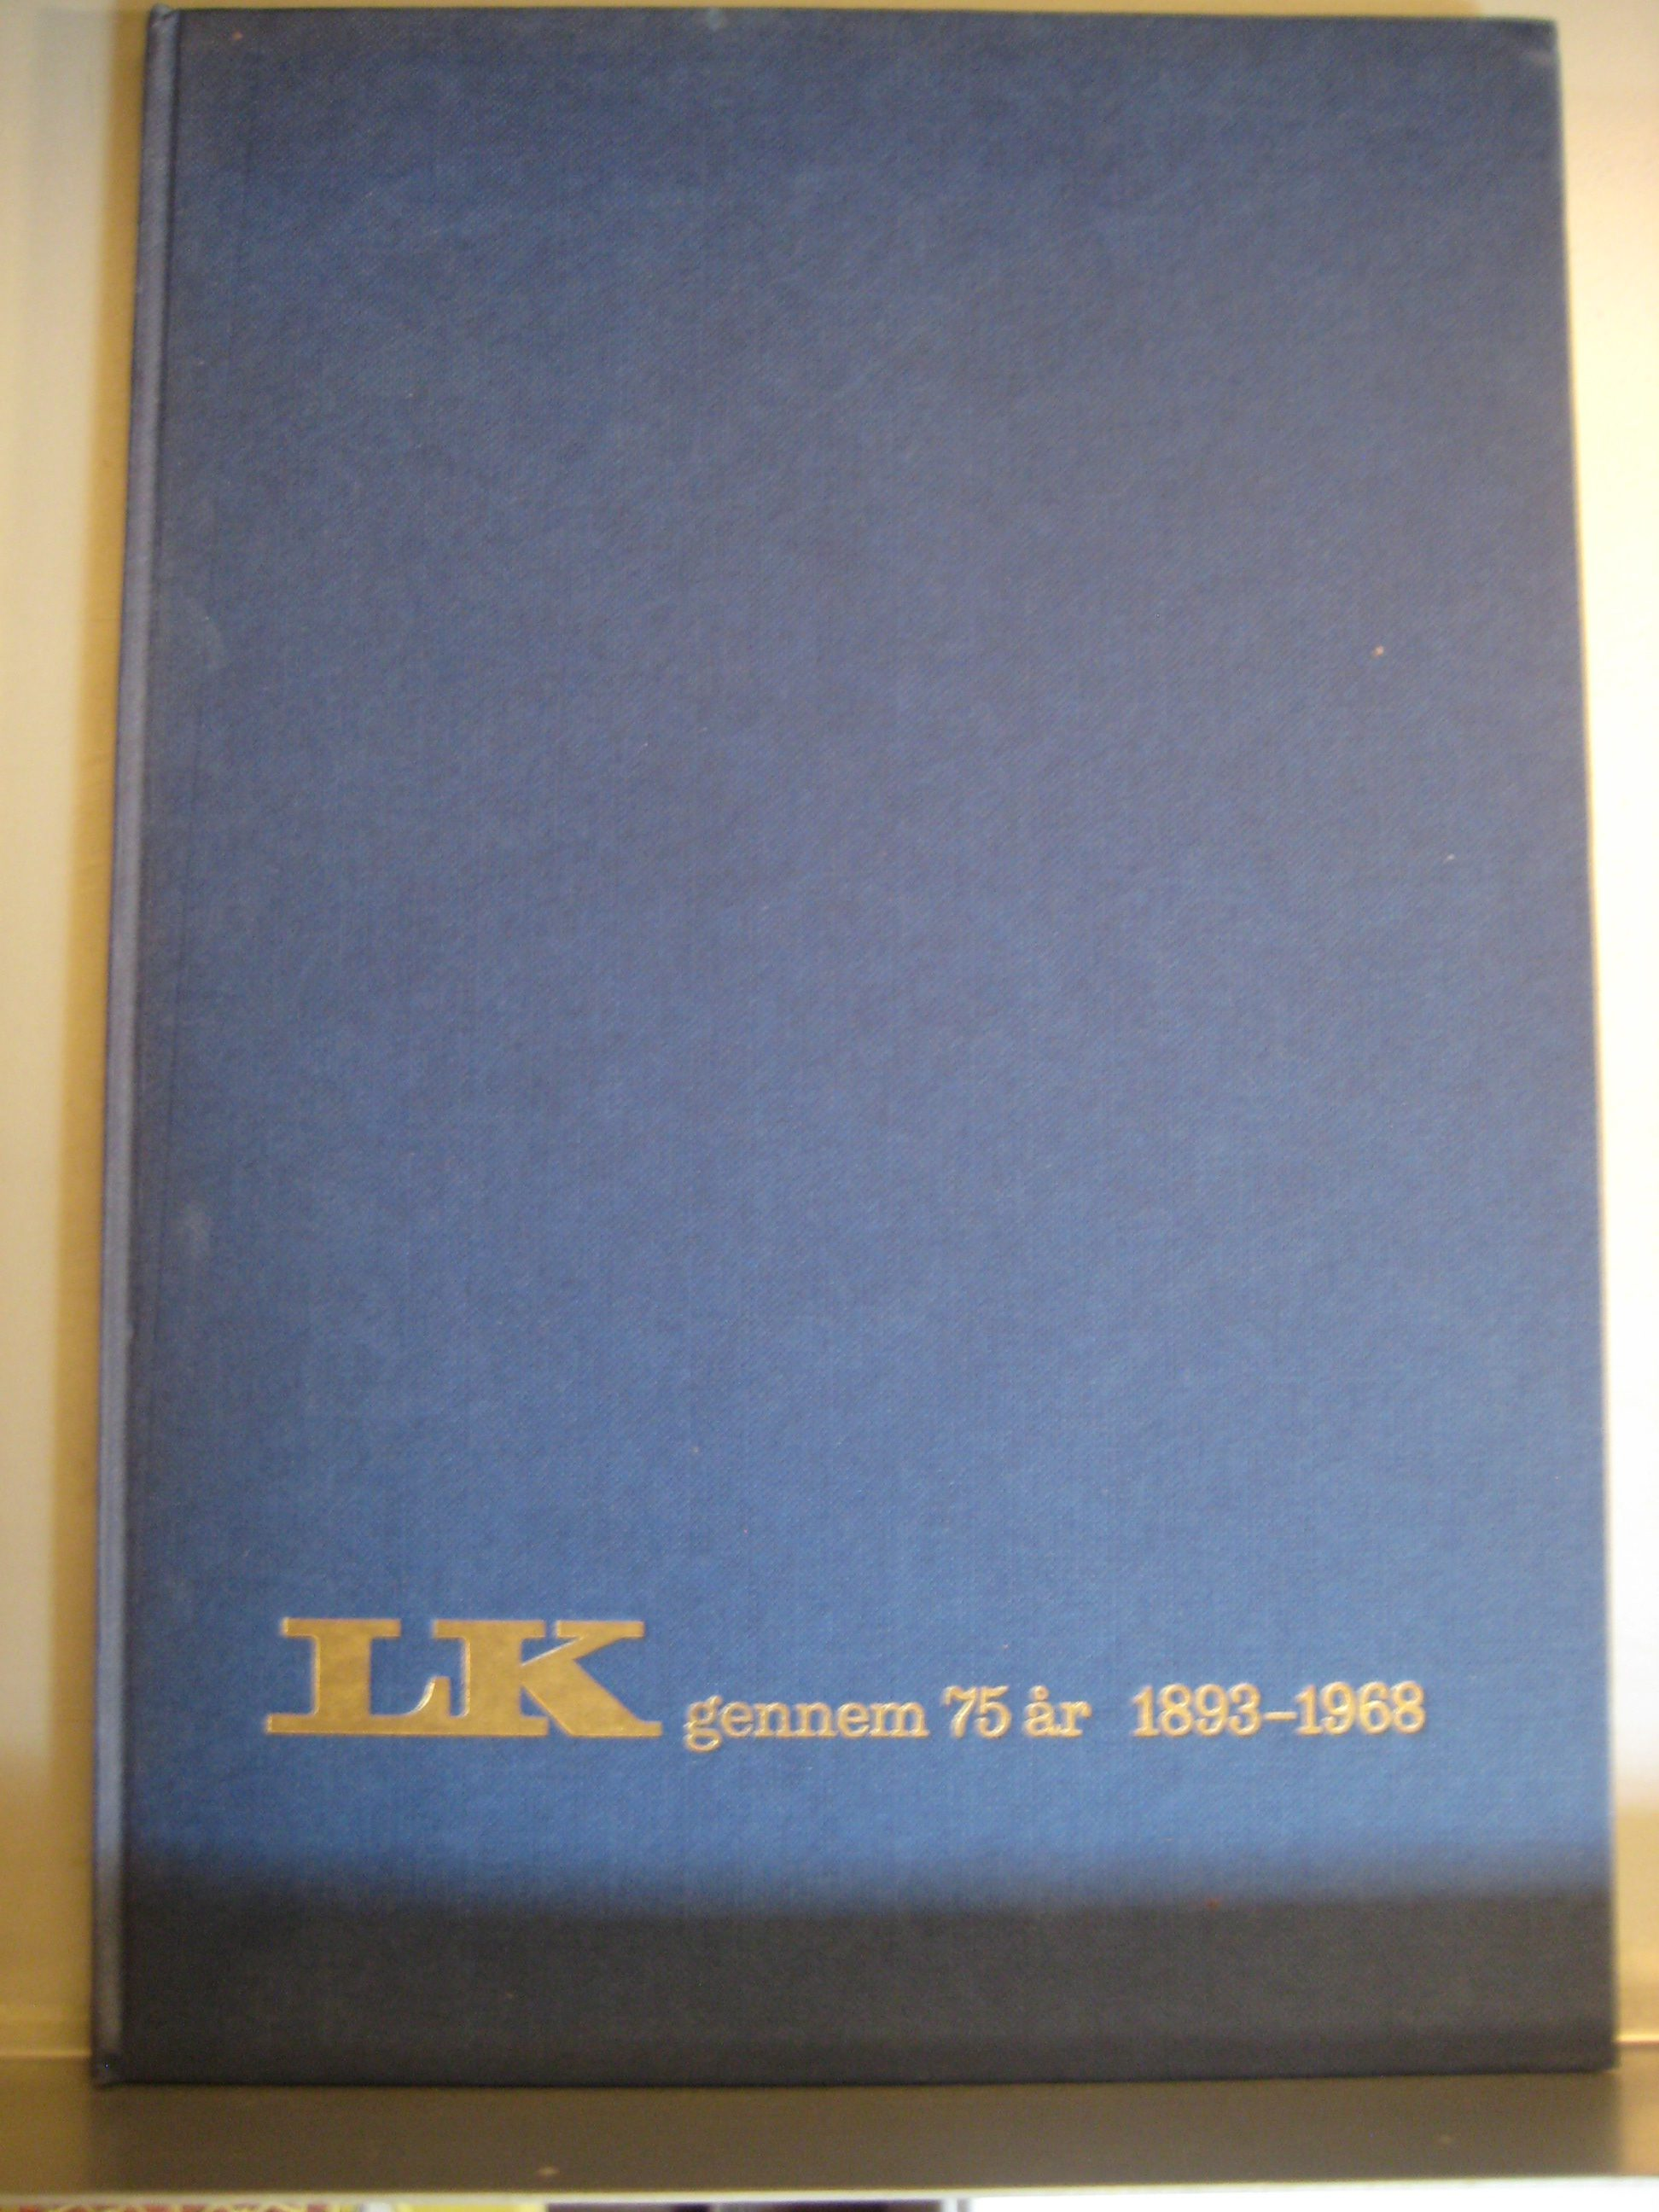 Laur. Knudsen 1893- 1968